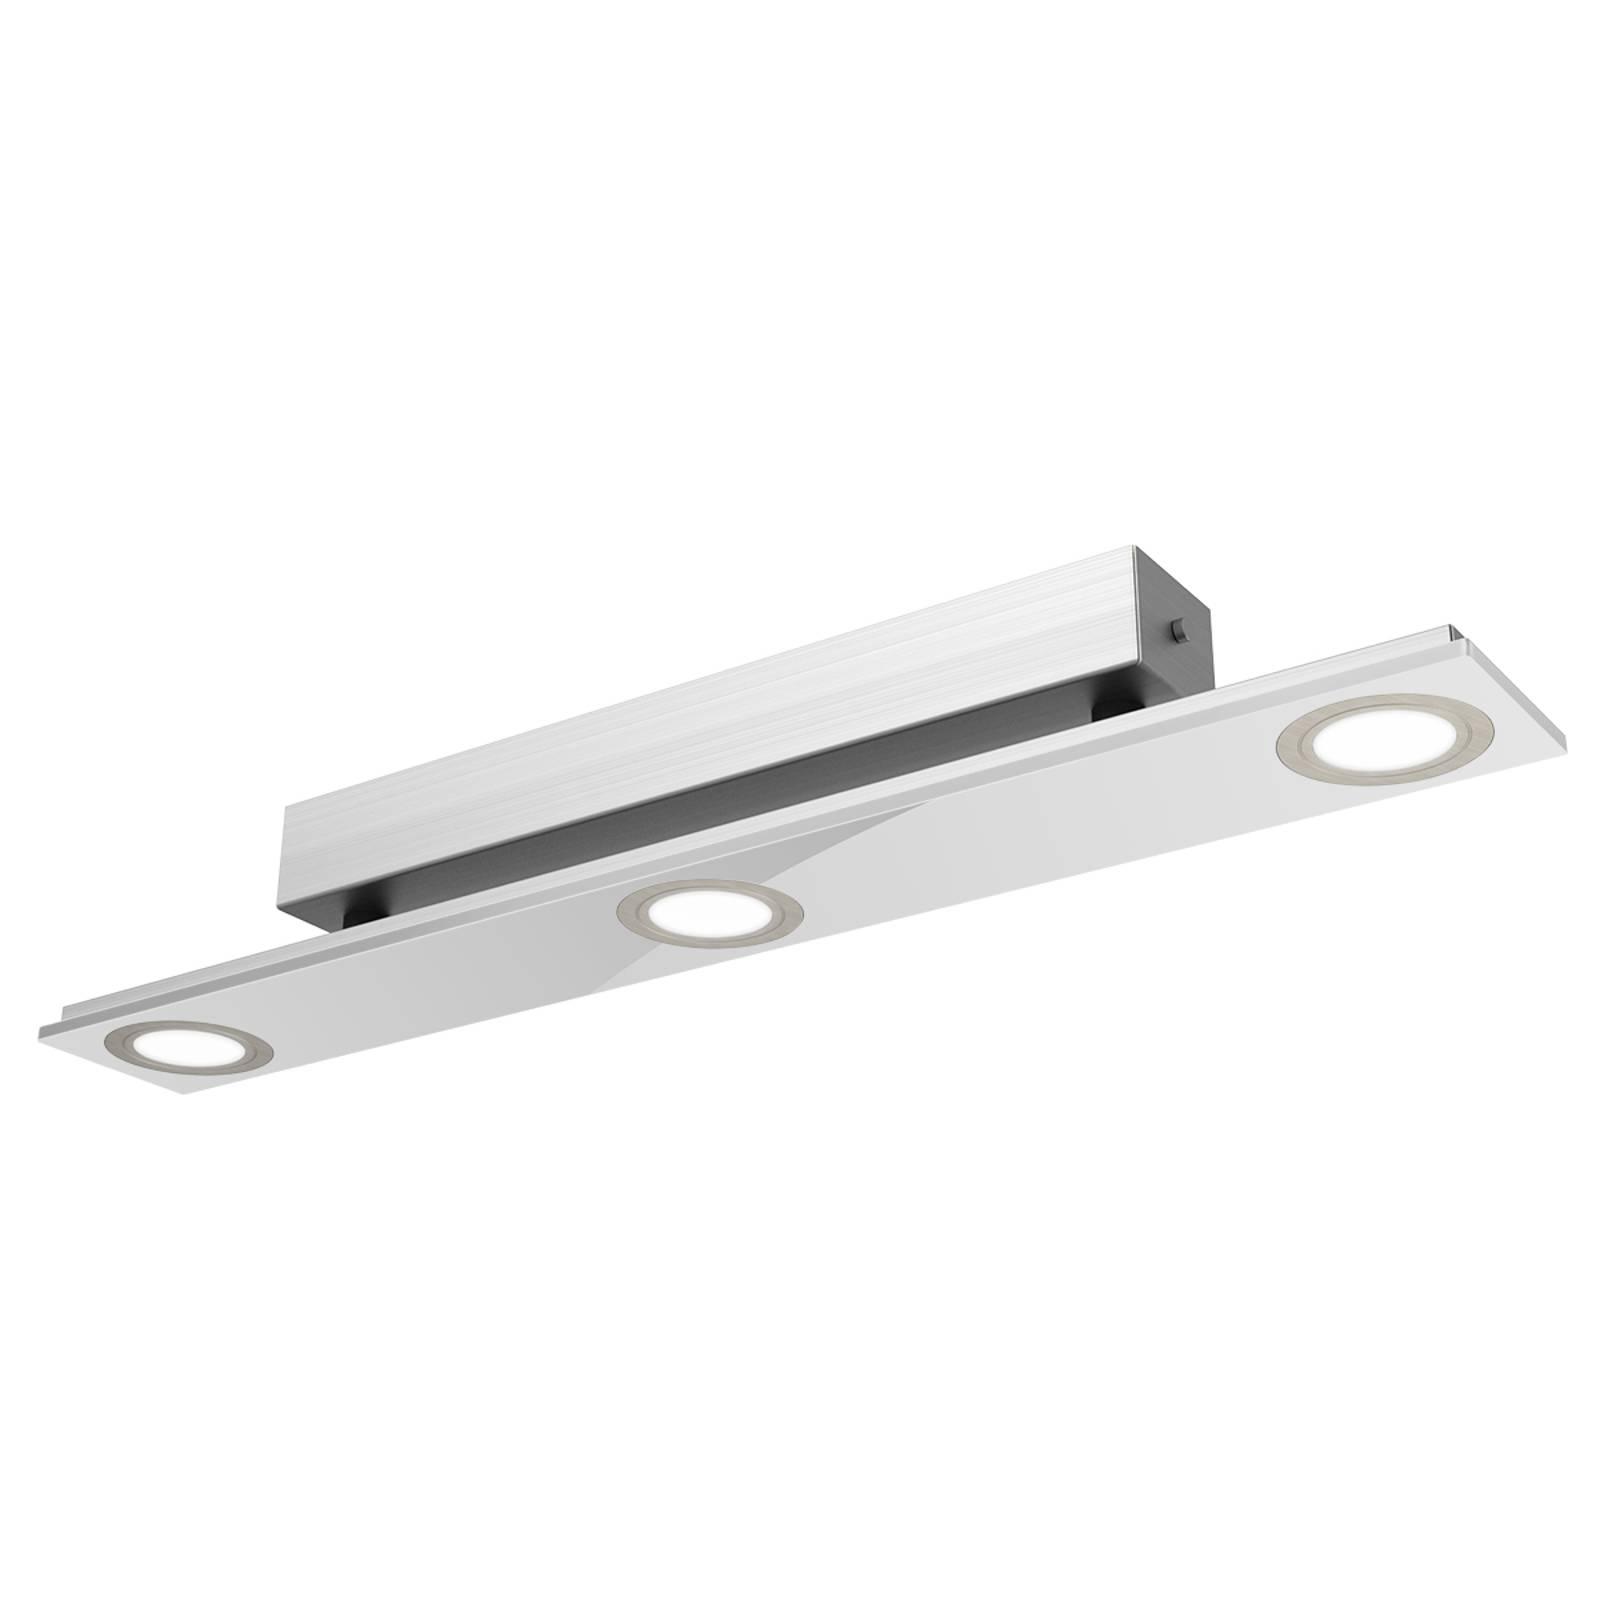 Pano - dreiflammige LED-Deckenleuchte in Metallic